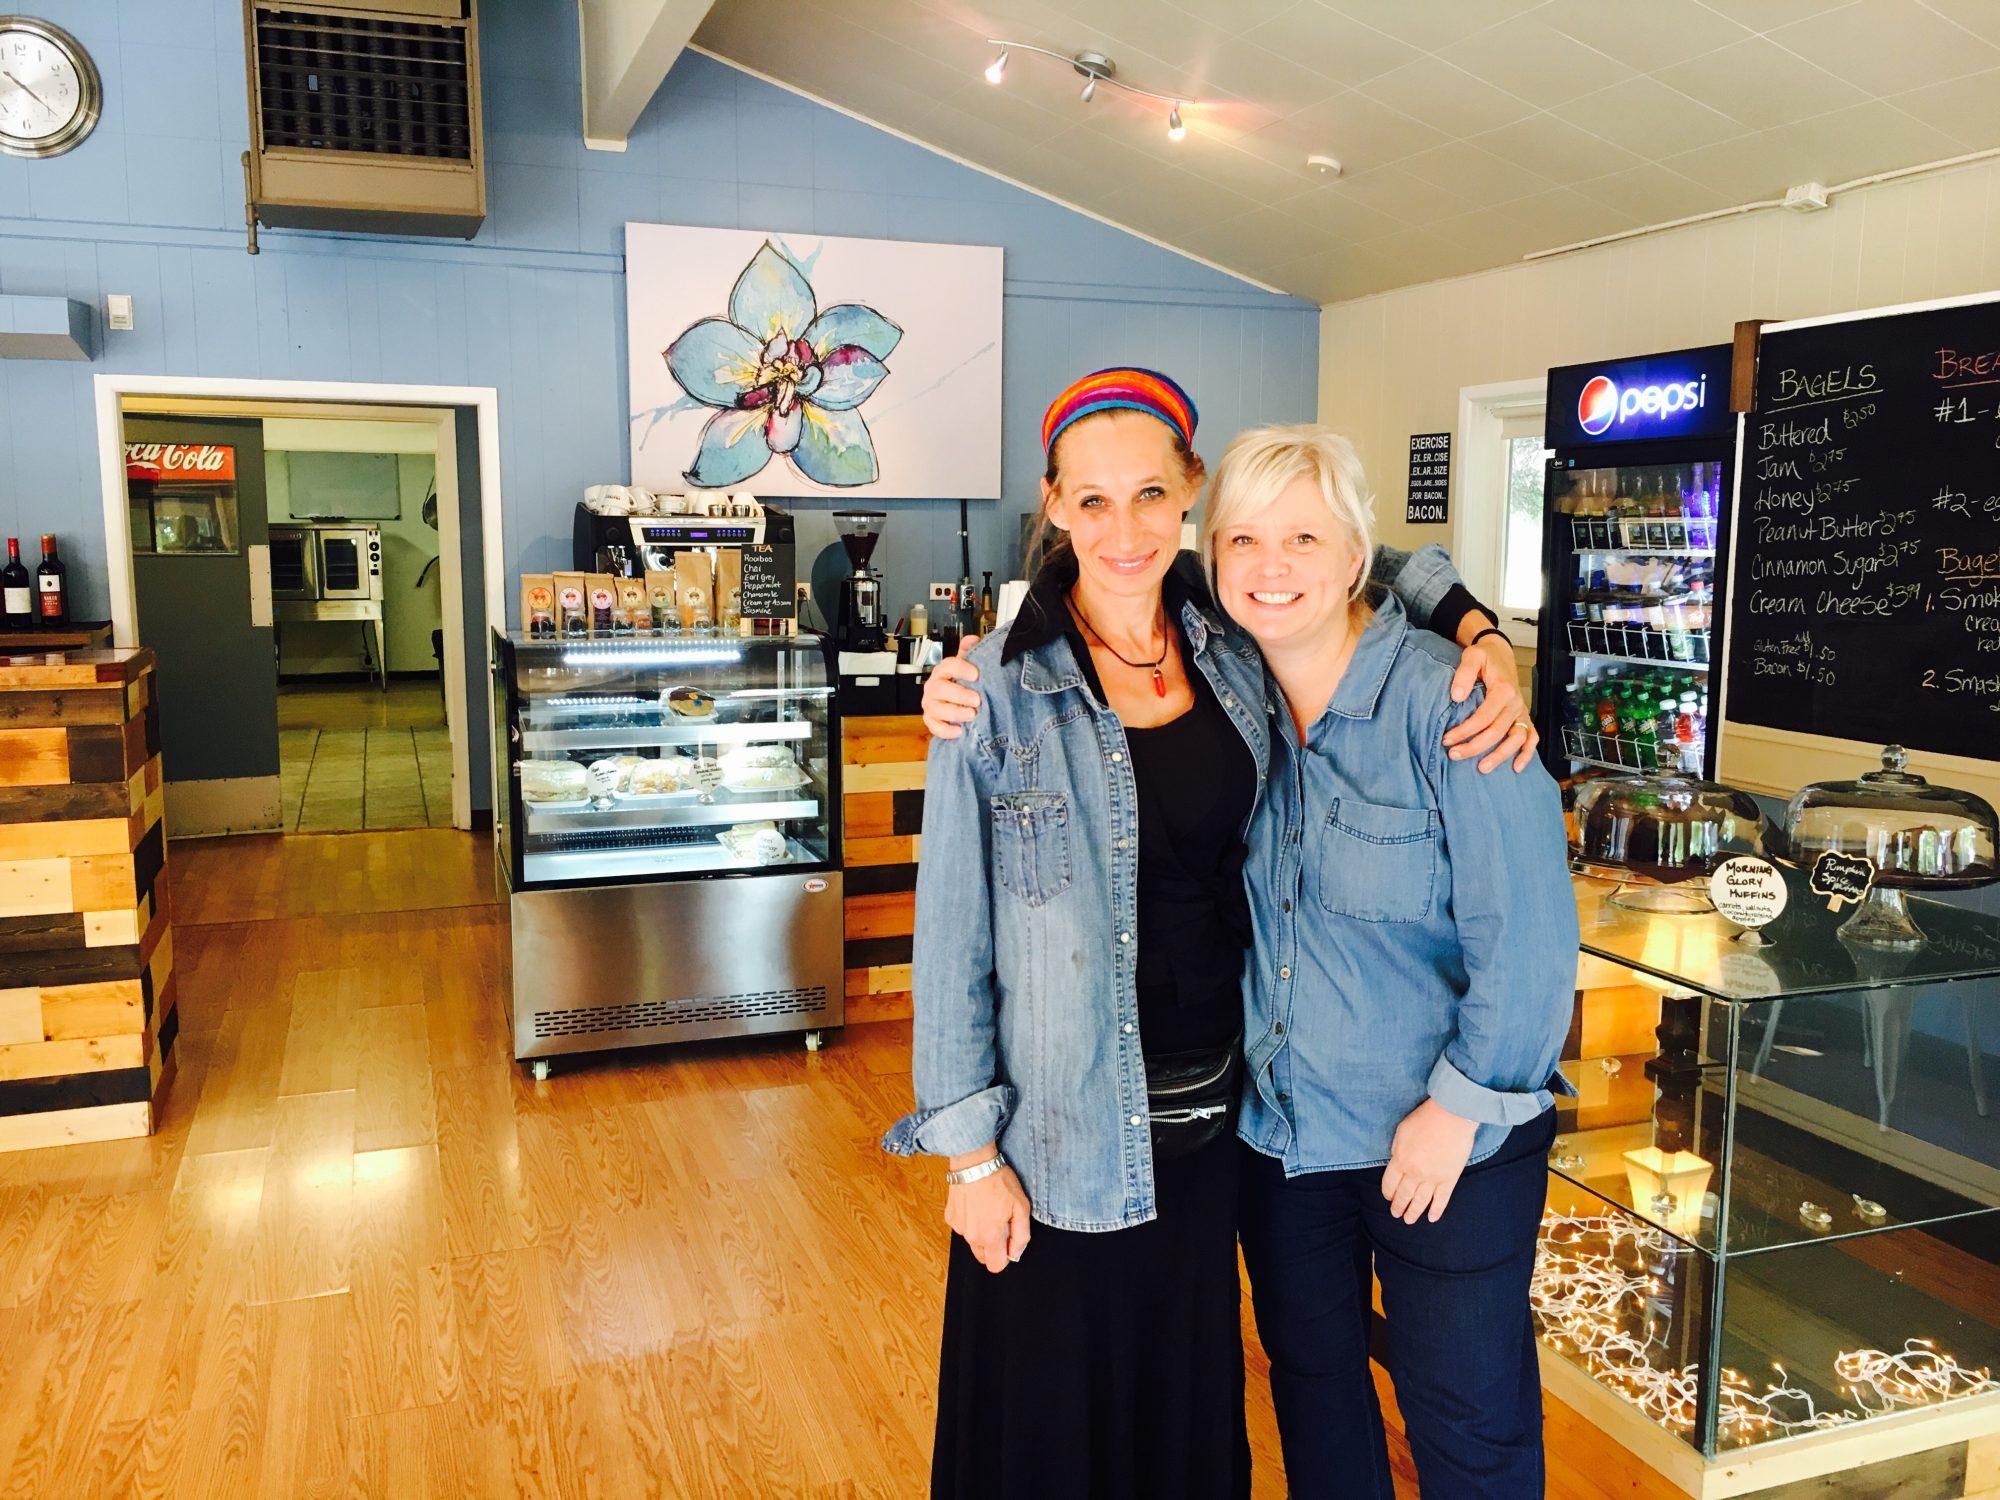 Cathy + Lara